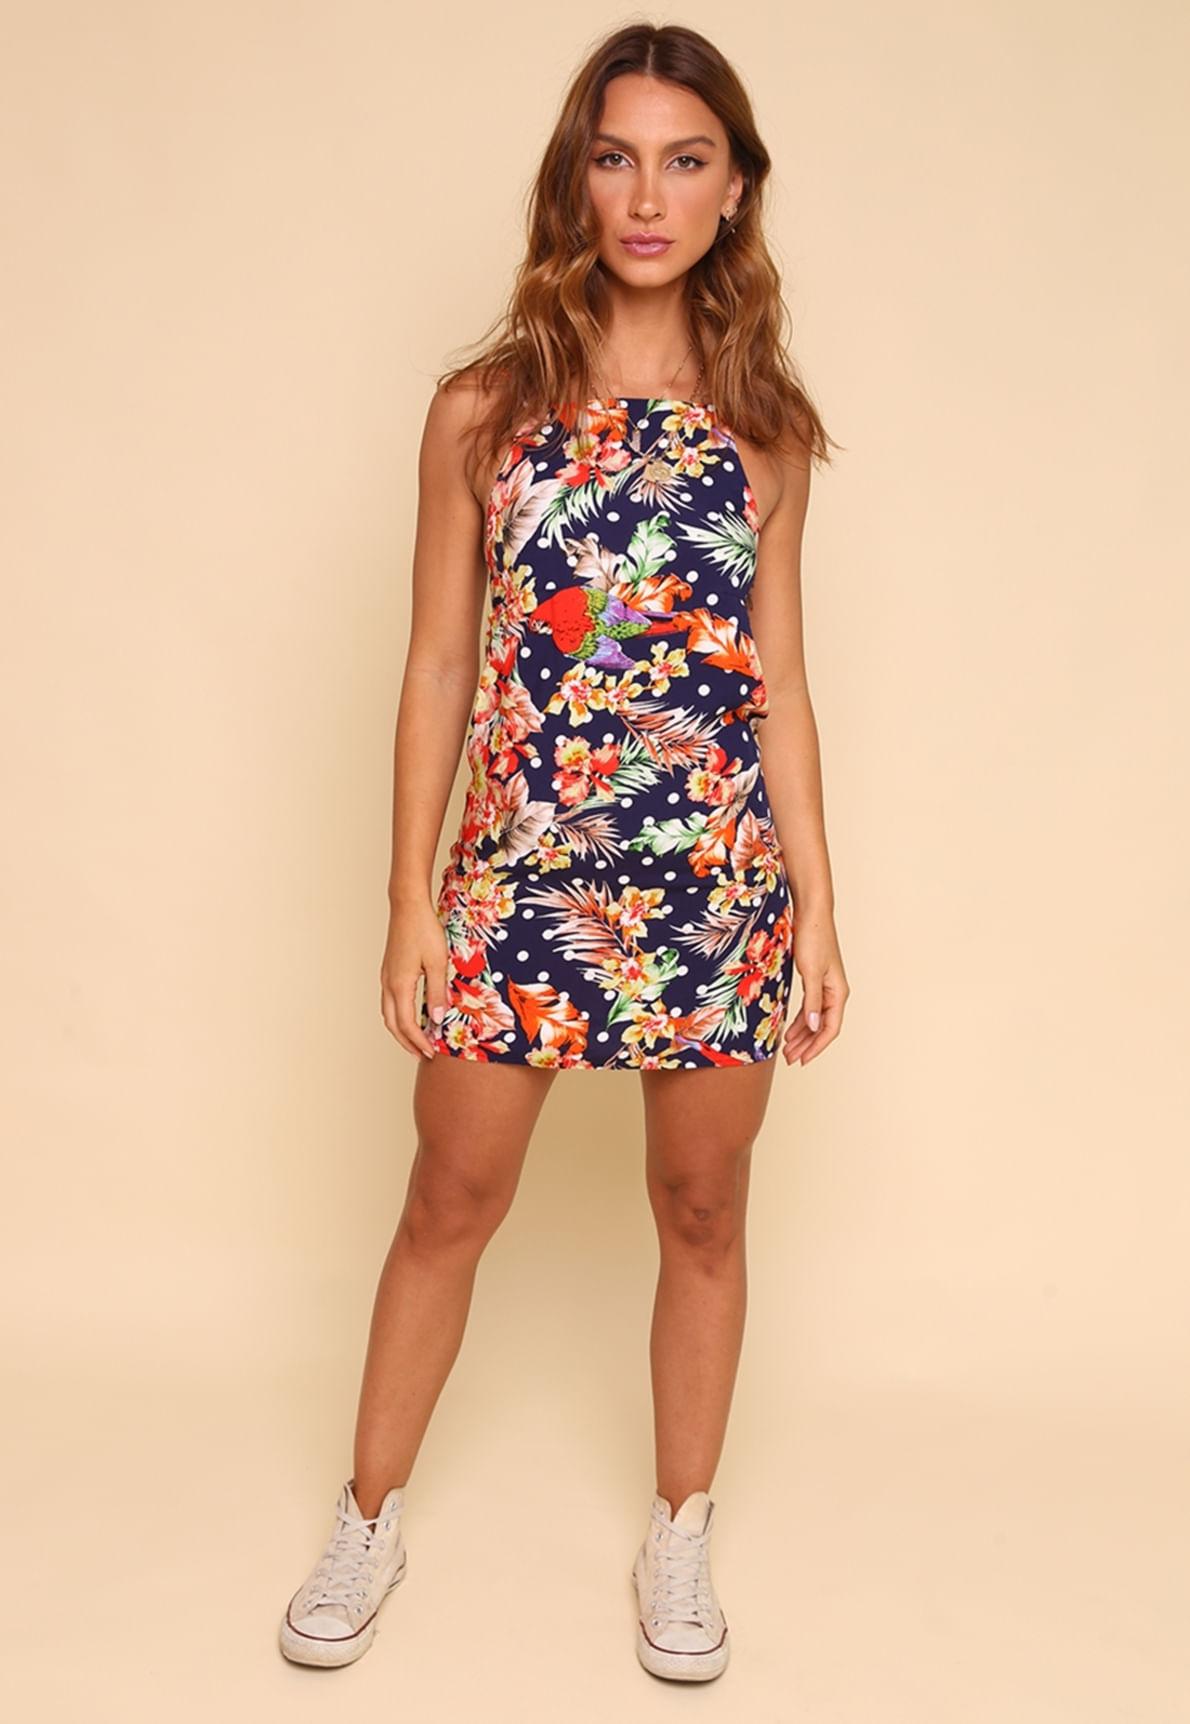 29504-vestido-floral-alison-mundo-lolita-01